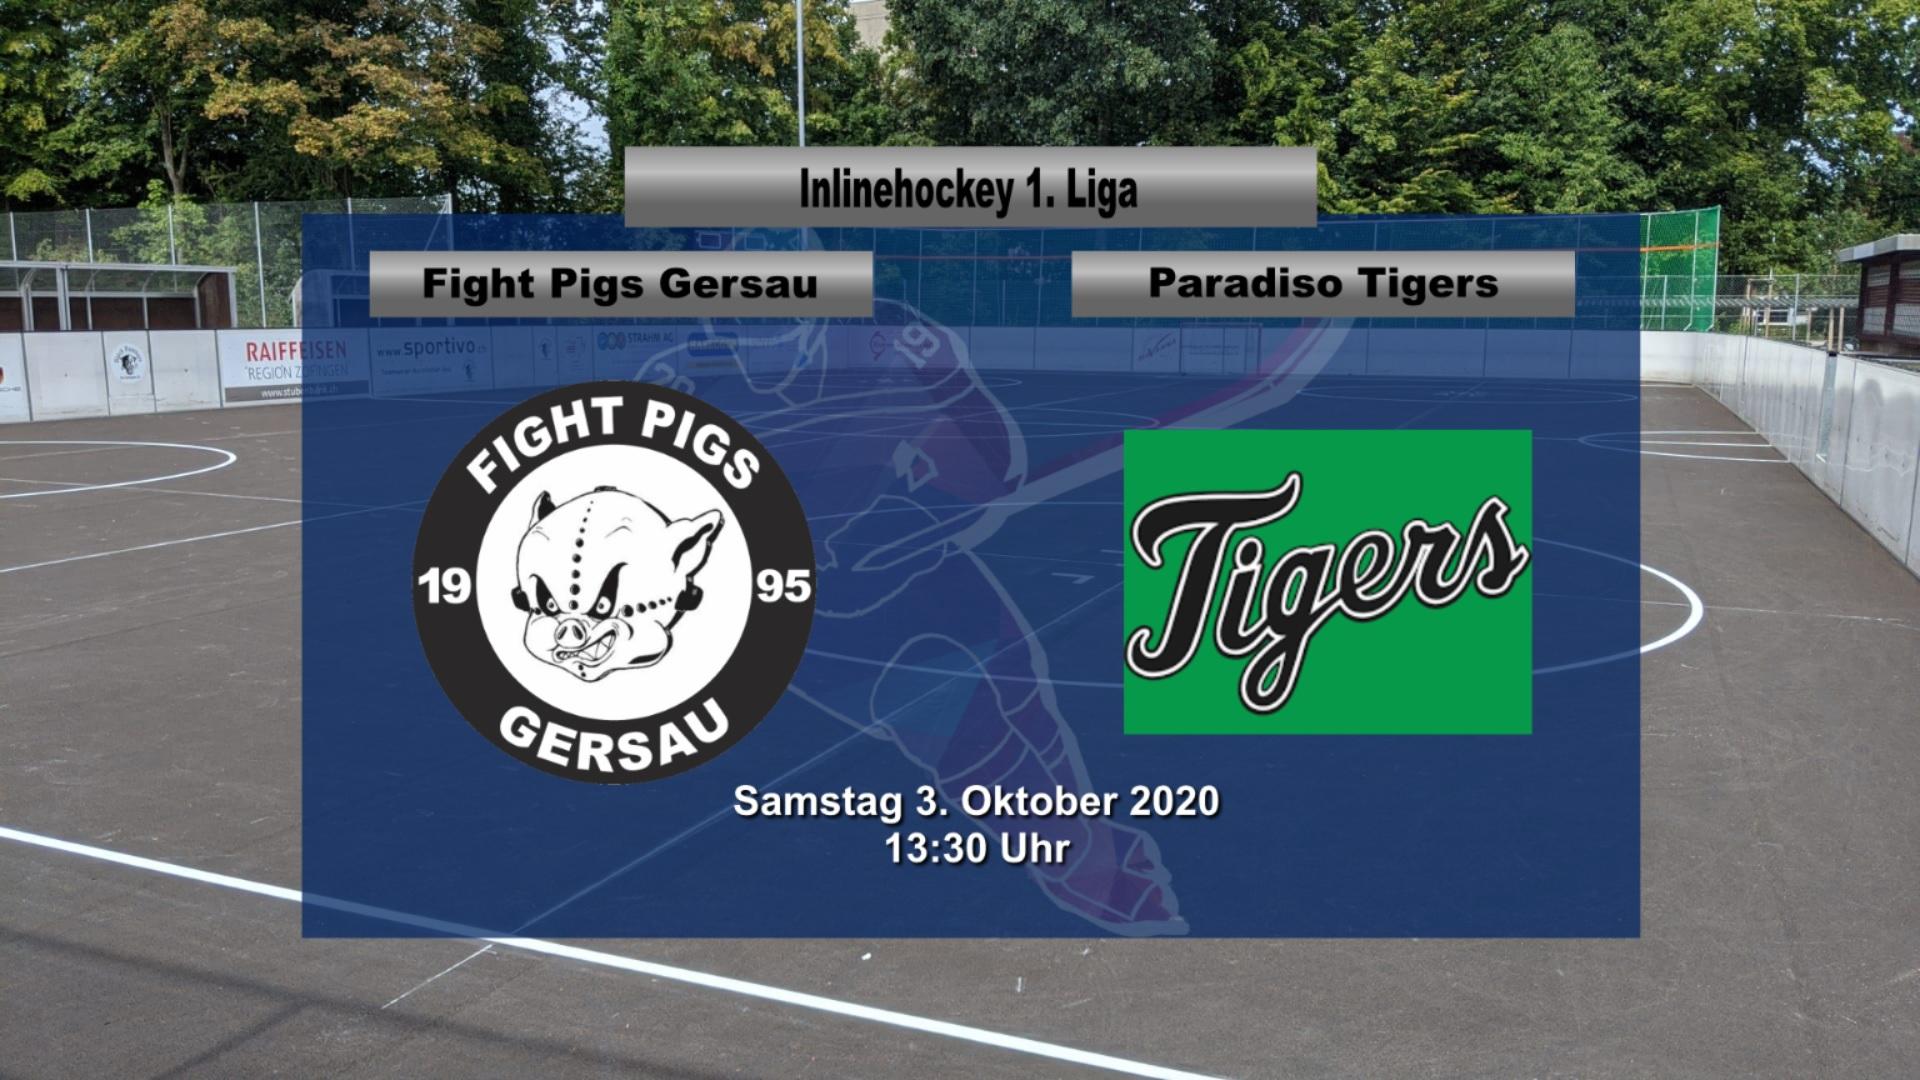 Inline Hockey 1. Liga Herren: Fight Pigs Gersau – Paradiso Tigers